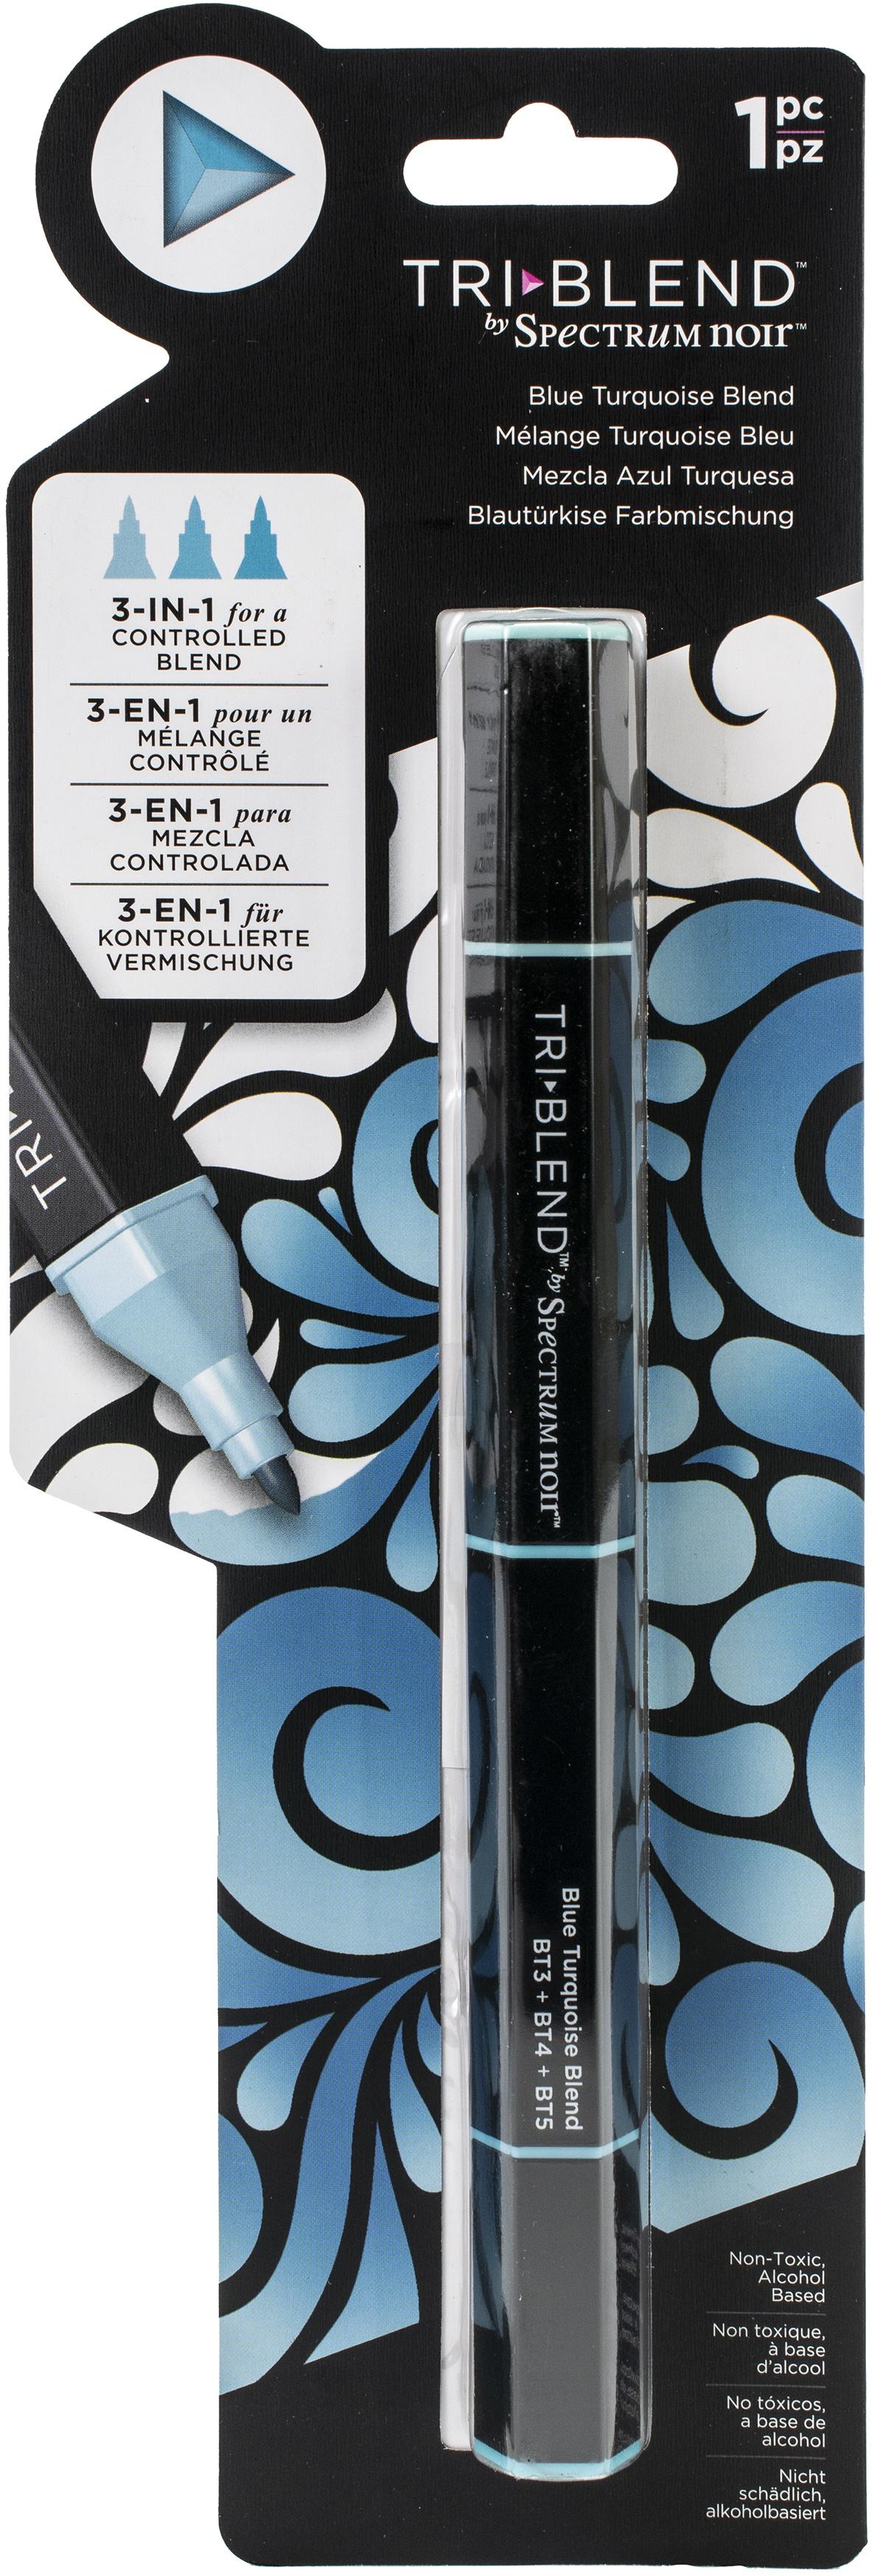 Spectrum Noir - Triblend Marker - Blue Turquoise Blend